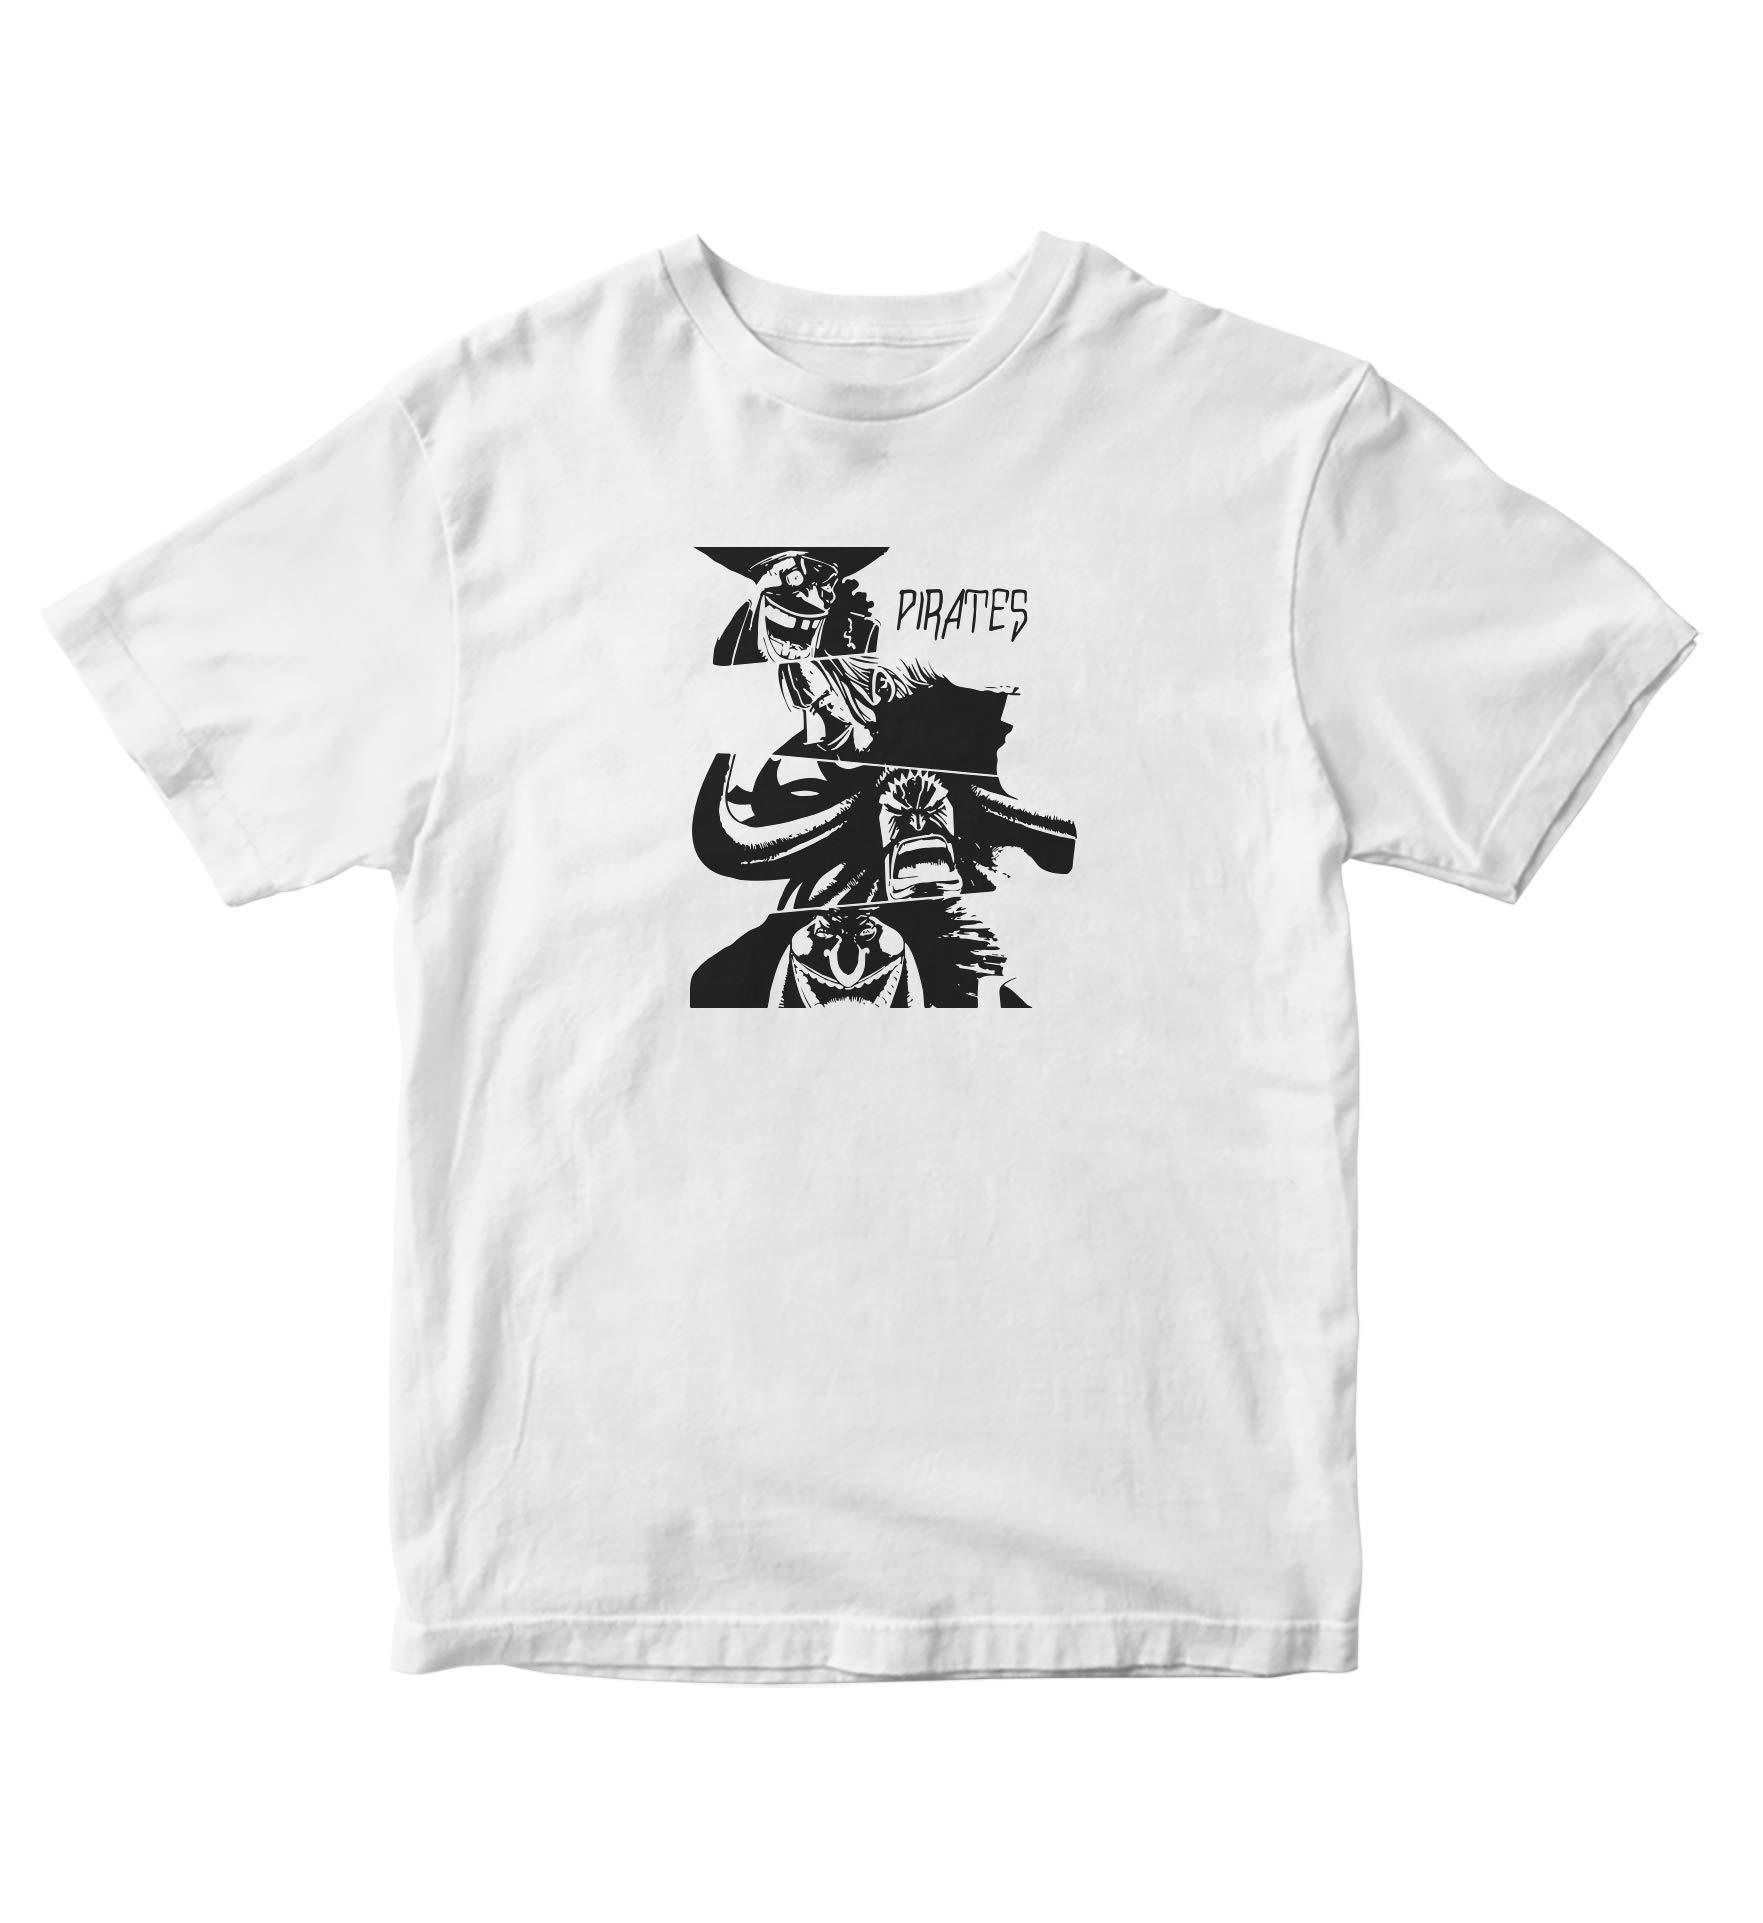 Tjsports One Piece Shirt Pirates Of Piece Anime Manga S A746